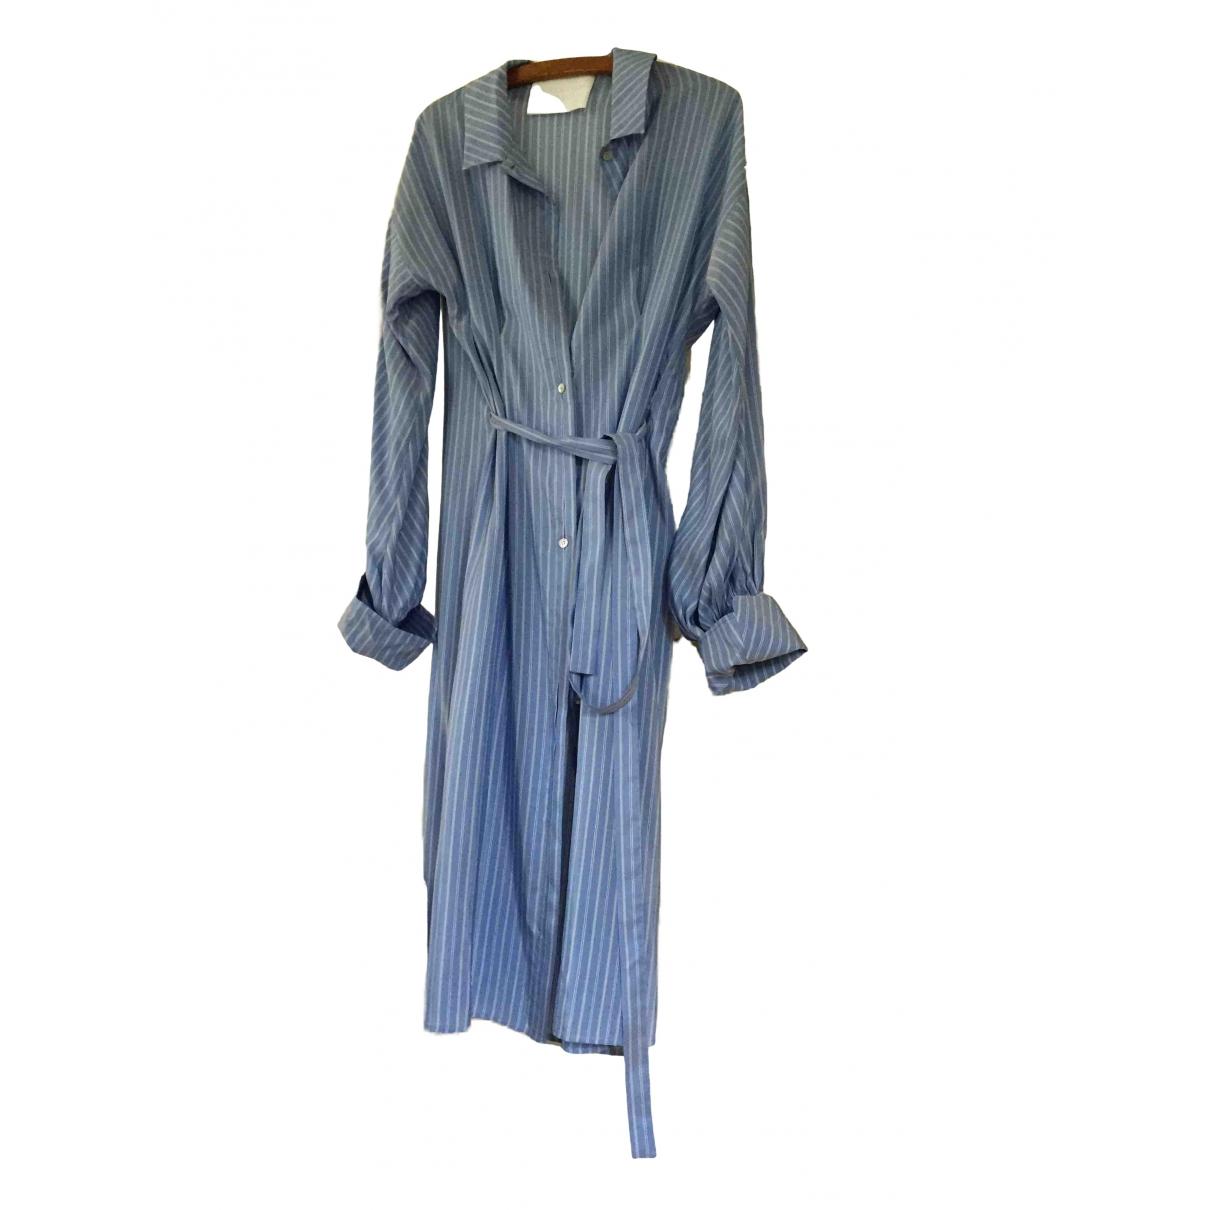 Mark Kenly Domino Tan \N Blue Silk dress for Women One Size FR